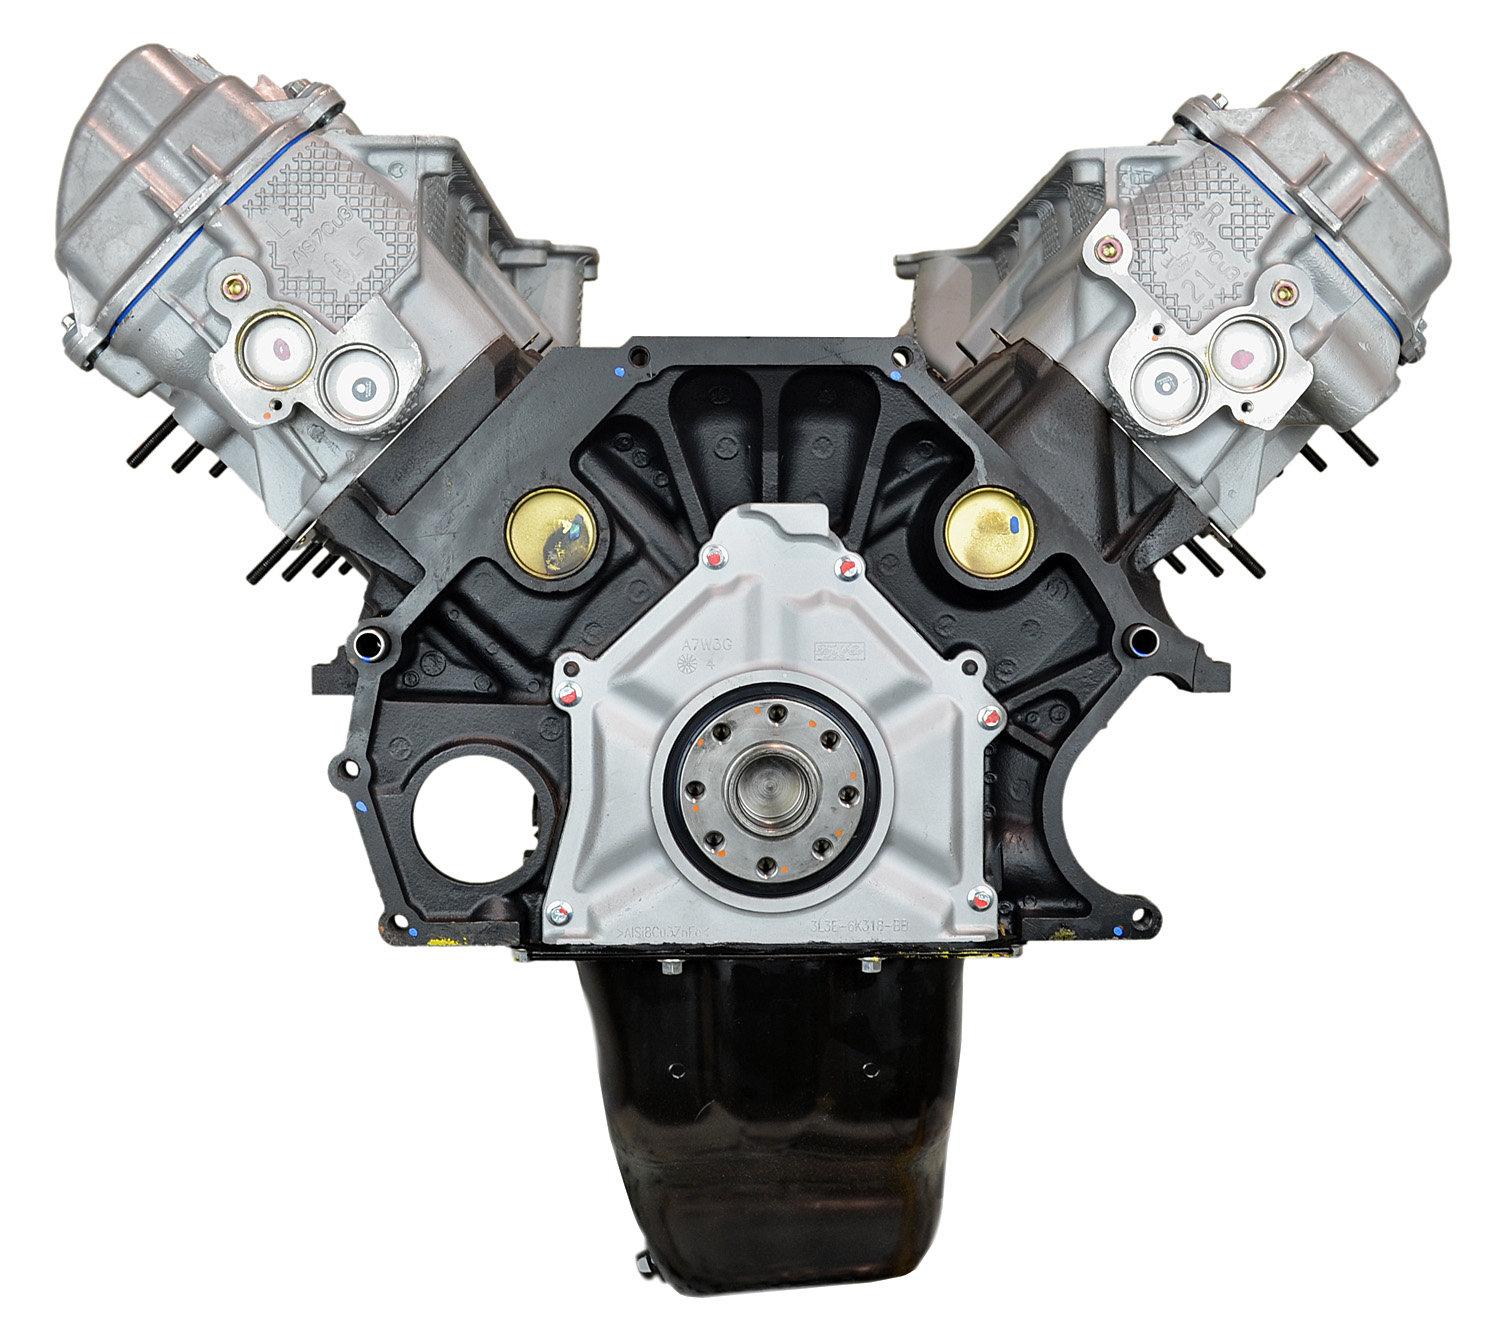 04-07 Ford 5.4L V8 F250 F350 Triton Engine 3 Valve